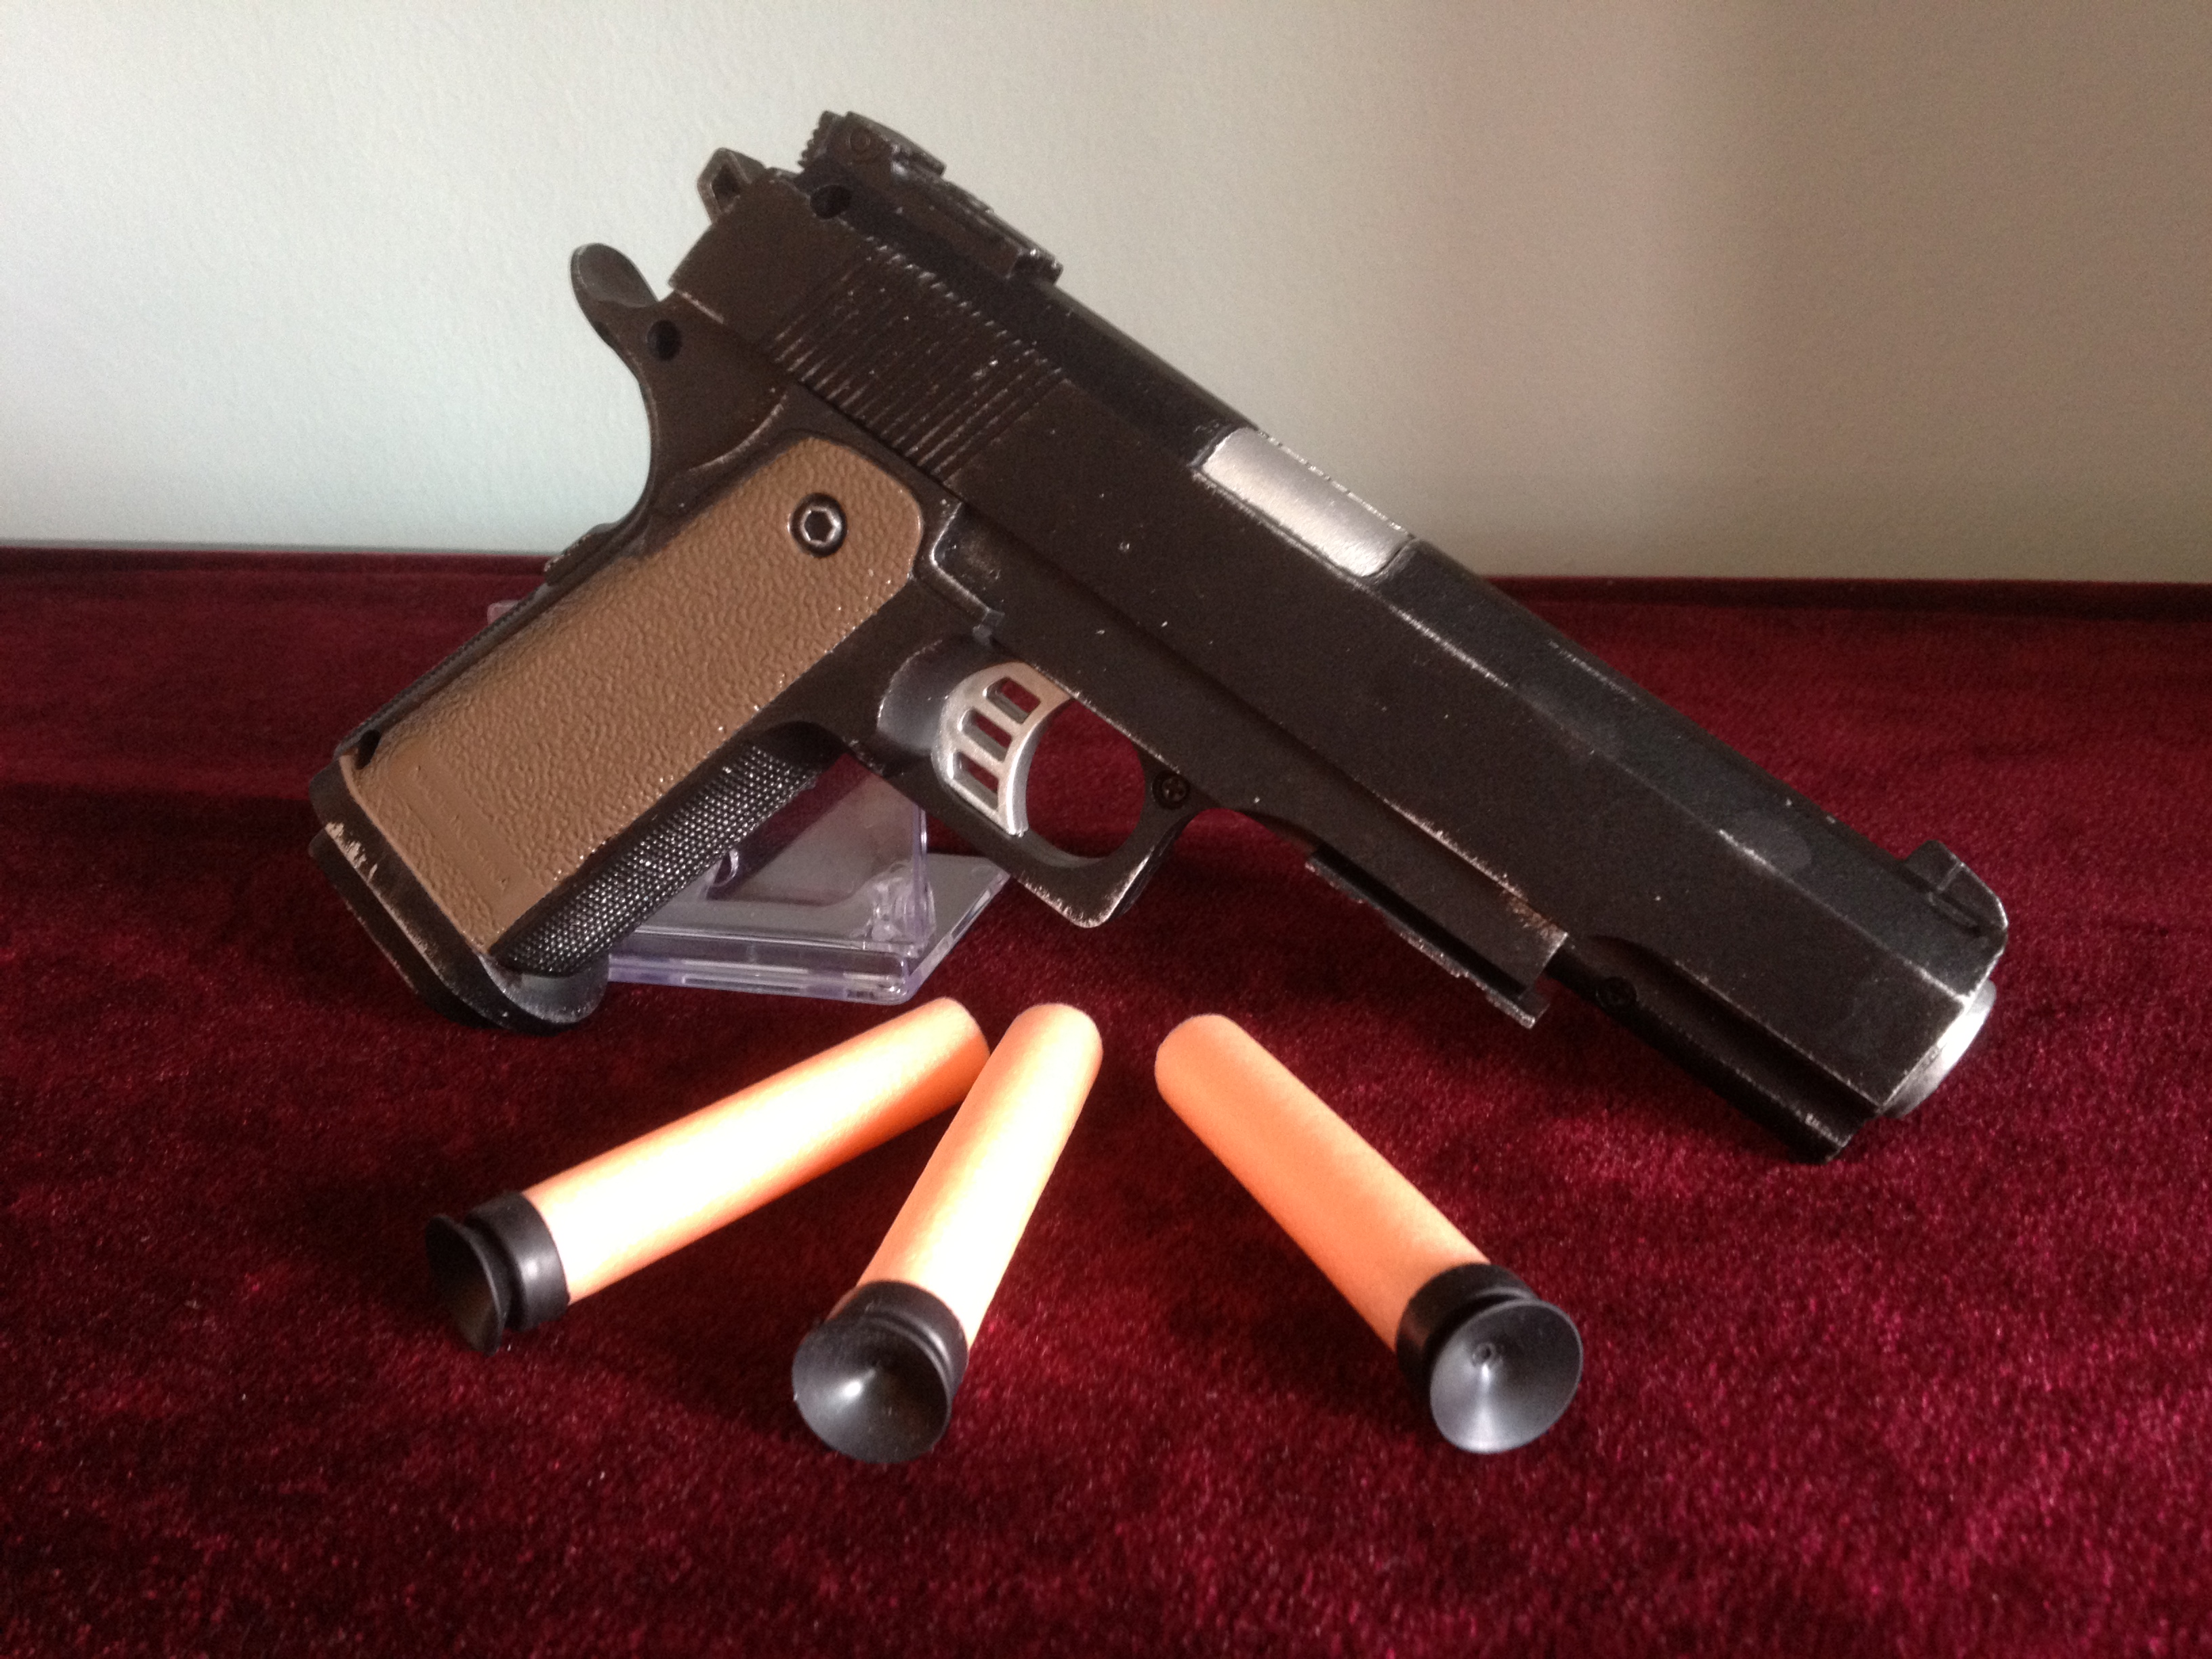 Nerf 1911 Pistol by Gavinlimkj Nerf 1911 Pistol by Gavinlimkj